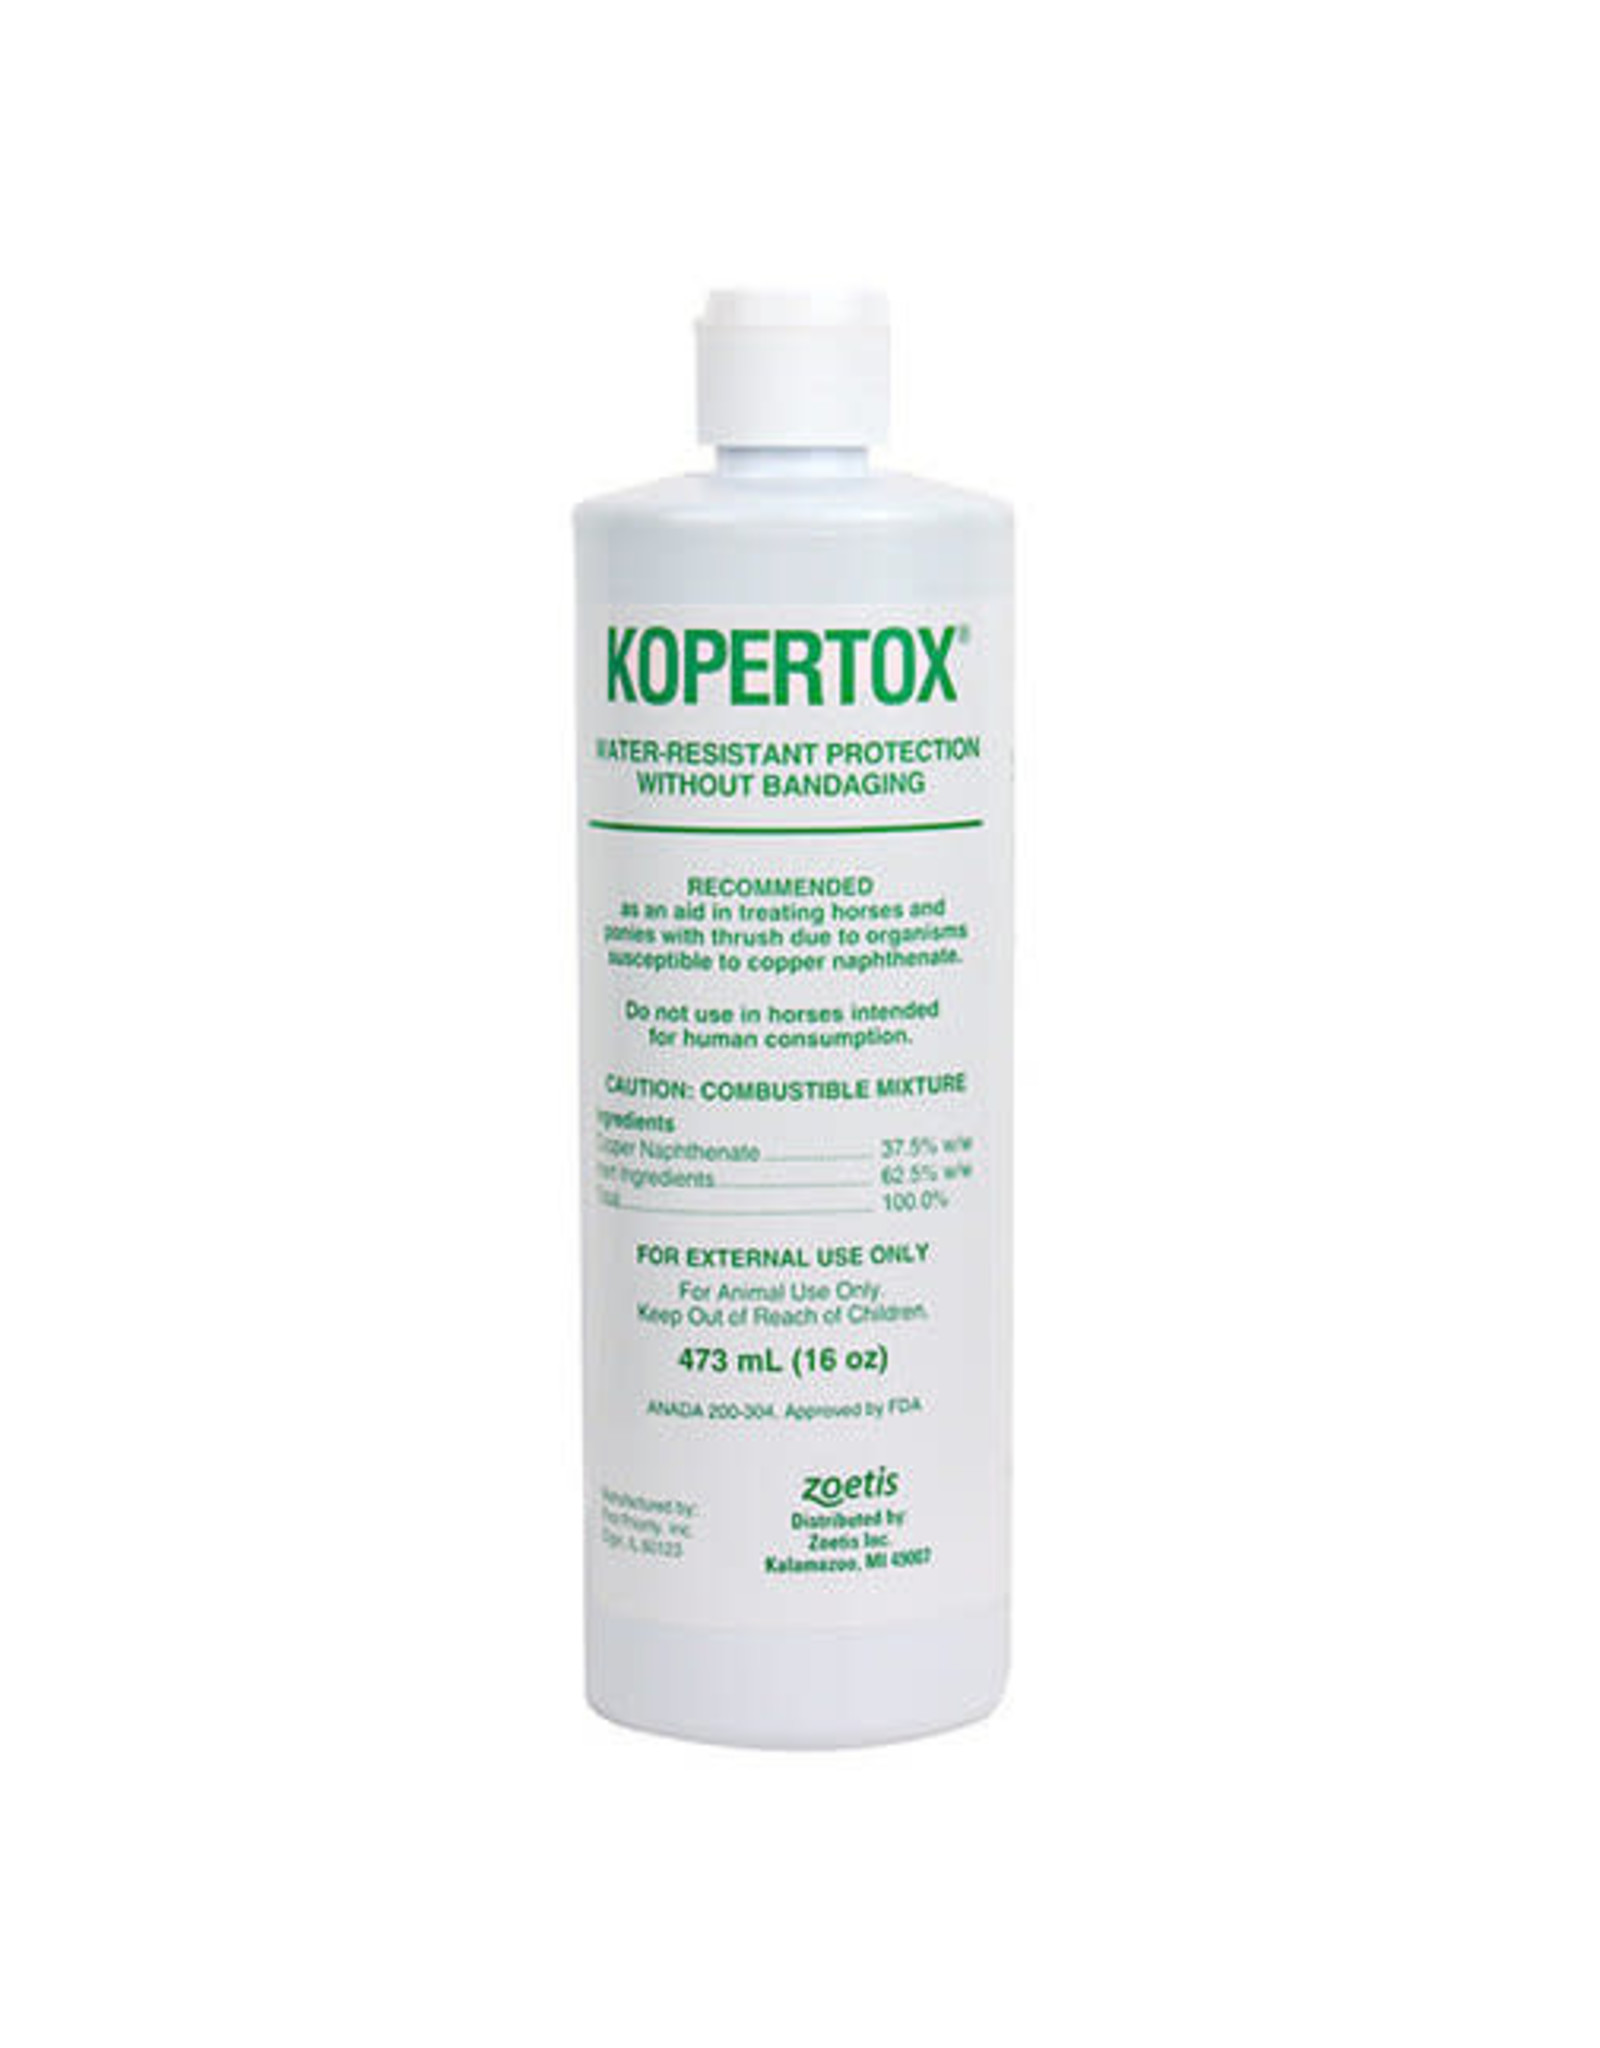 Kopertox